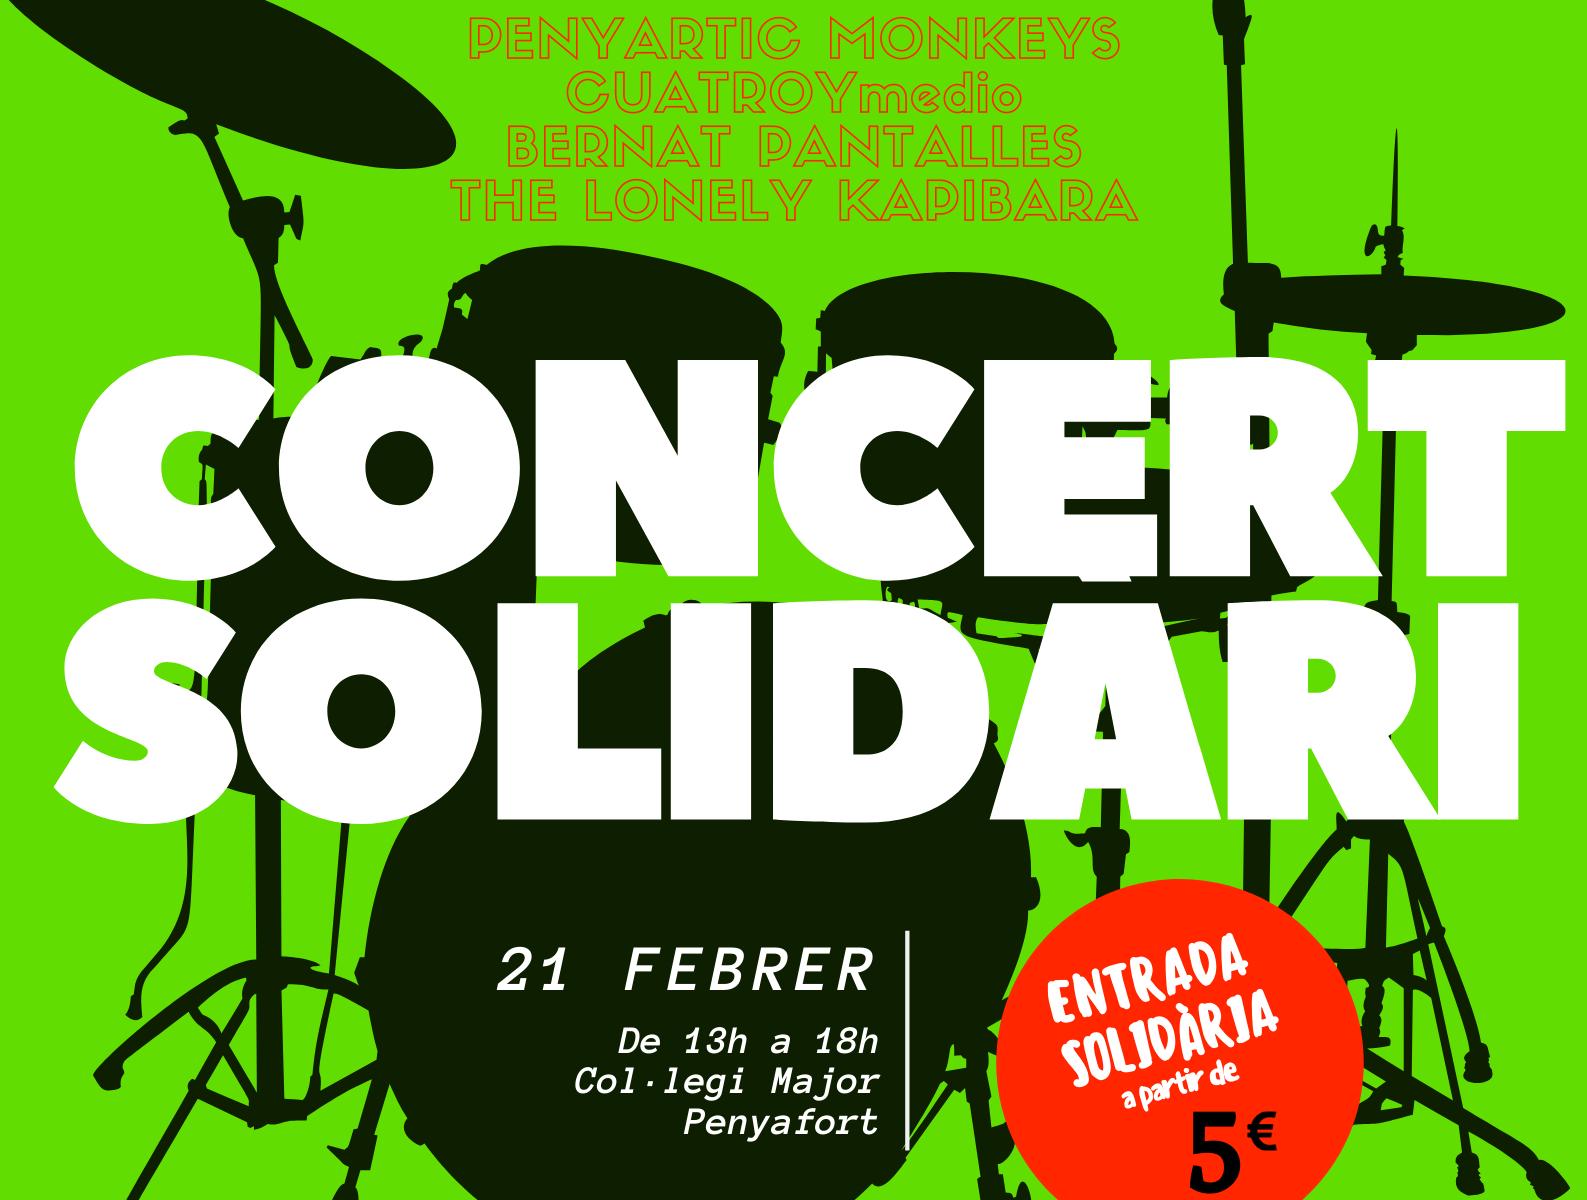 Cartell promocional 1er Concert Solidari The07gift